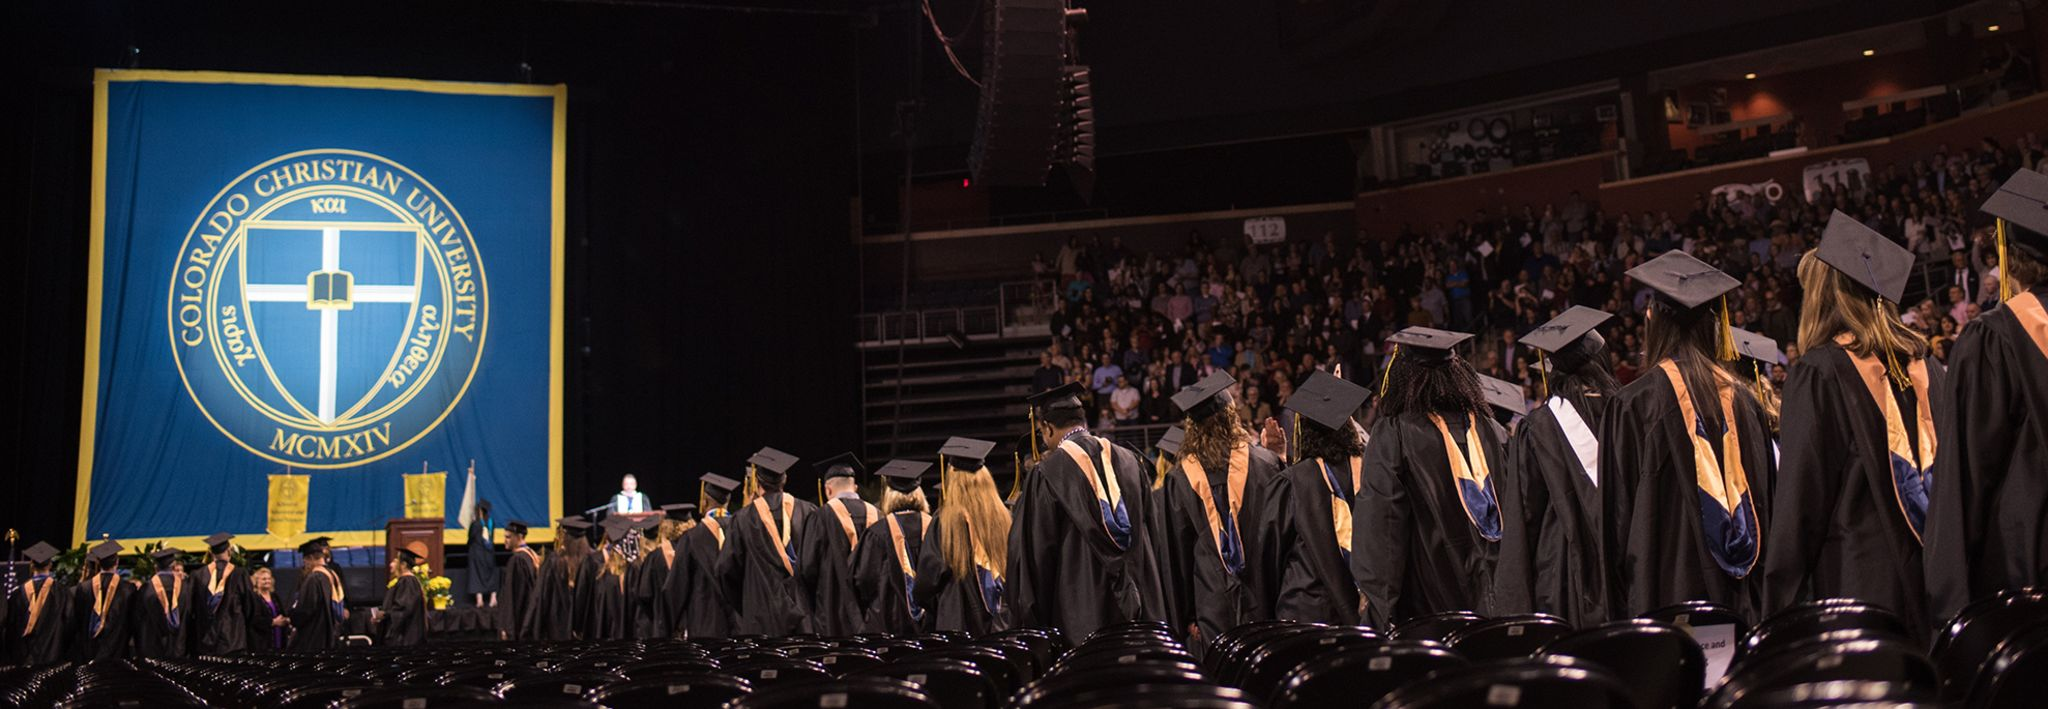 Students graduating from Colorado Christian University.